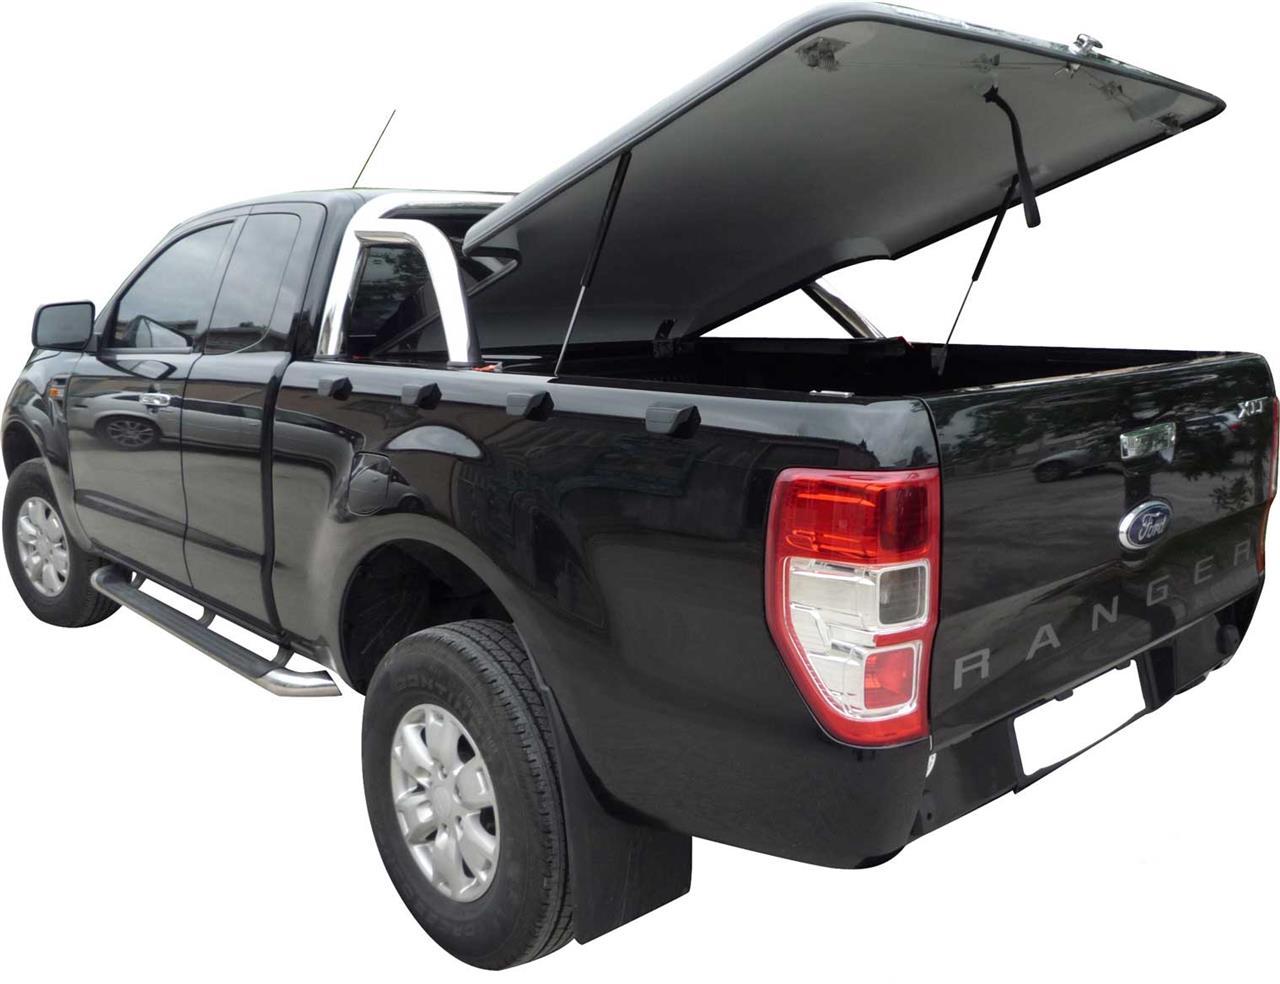 ct298 tonneau cover ct ford ranger 2012 super cab compatible roll bar d 39 origine ford ranger. Black Bedroom Furniture Sets. Home Design Ideas